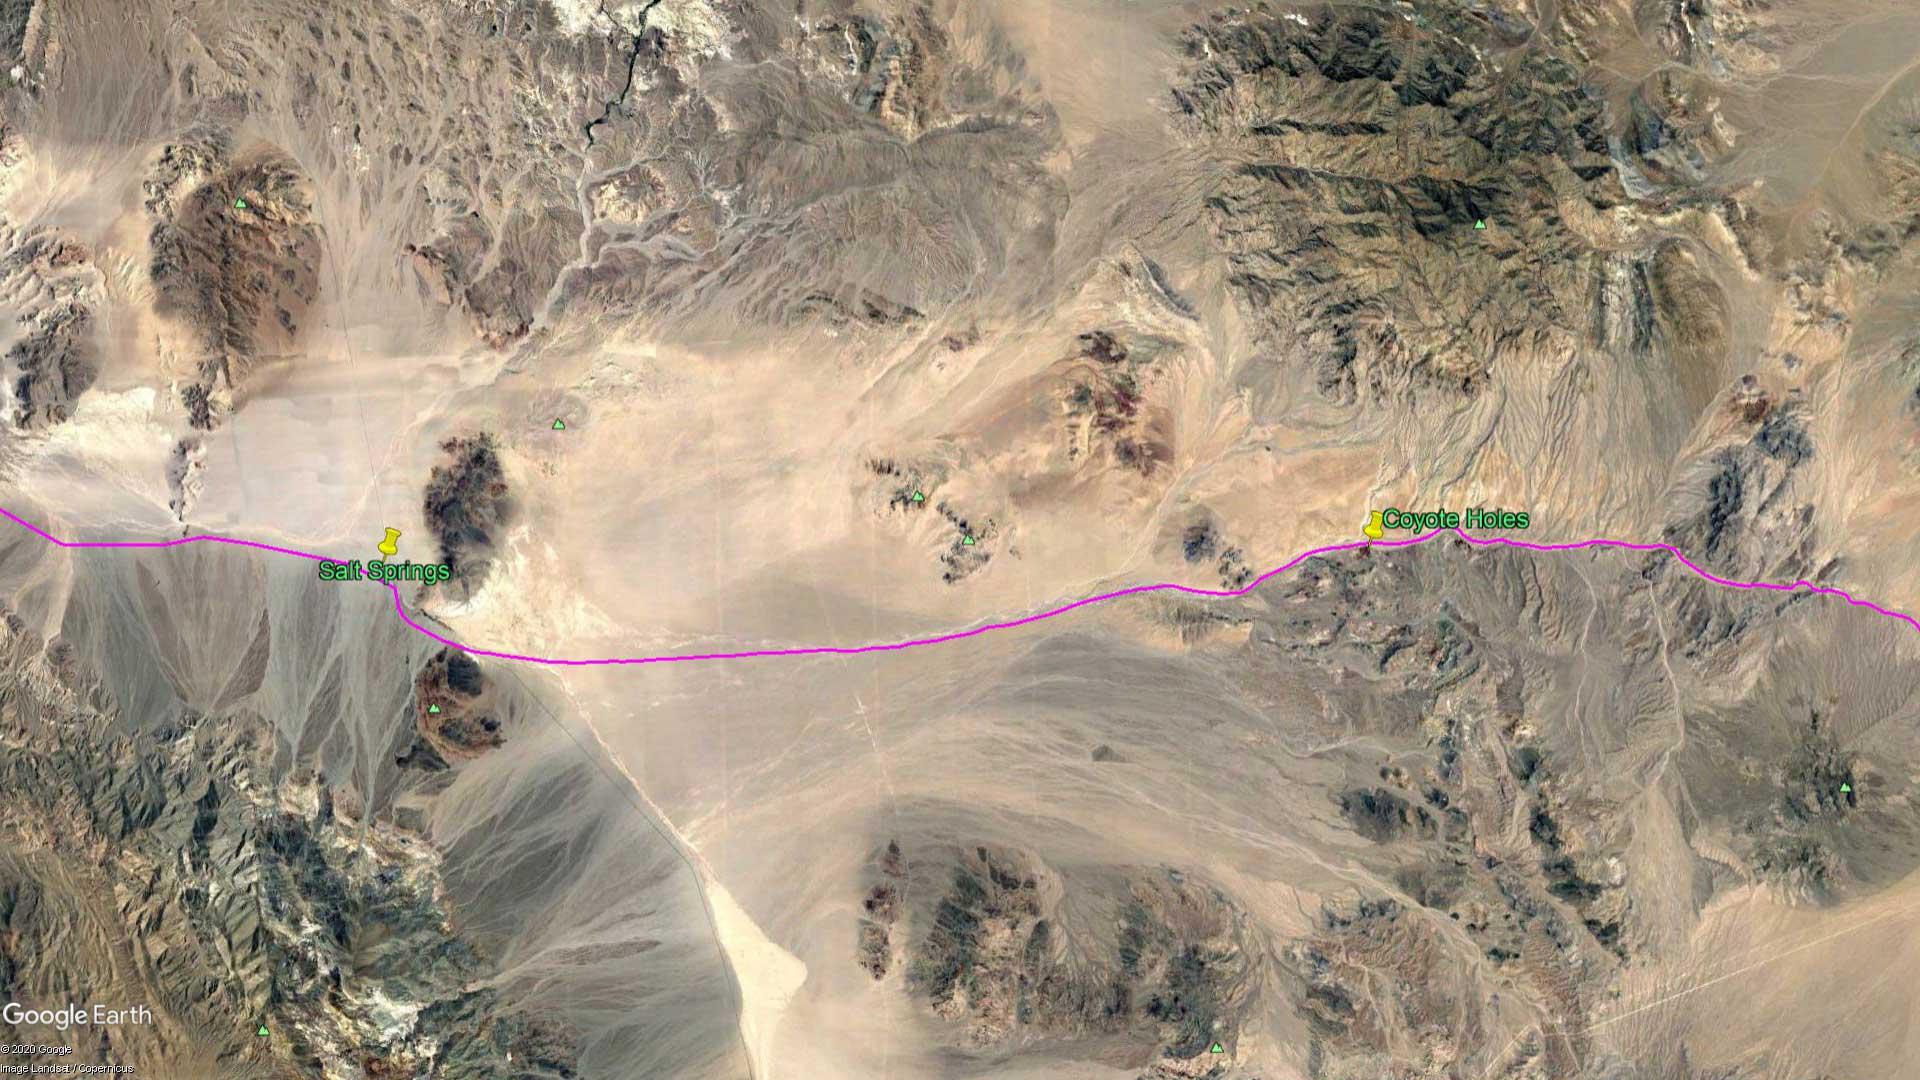 April 8, 1870 - The Mojave Desert